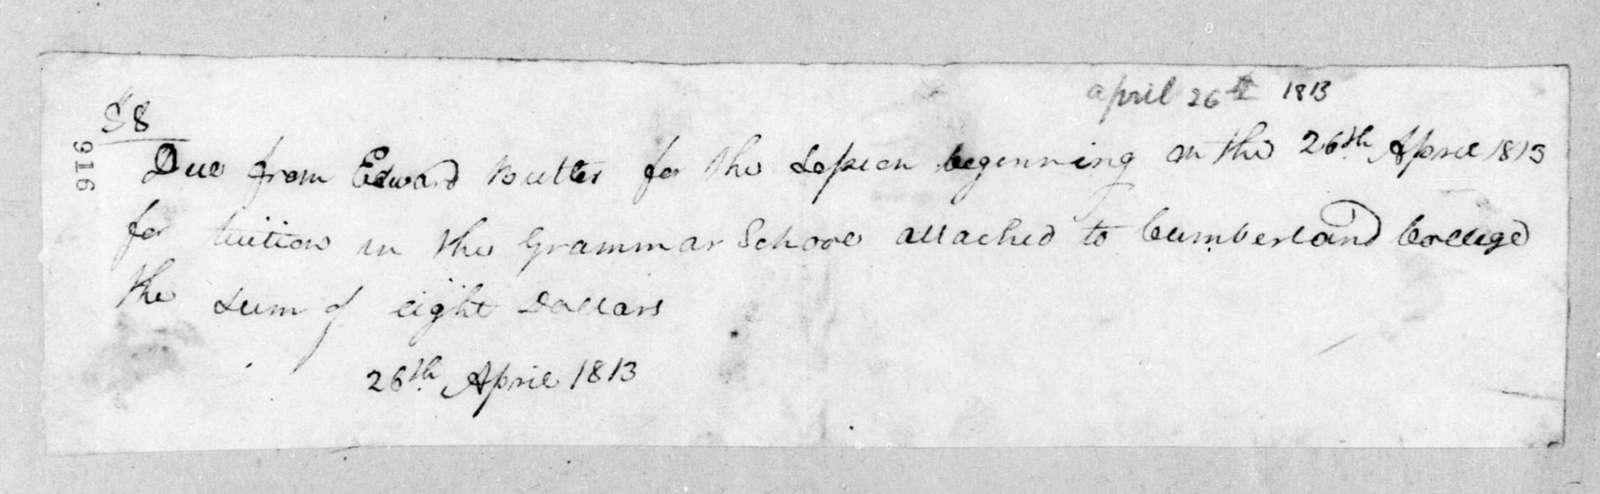 Cumberland College to Andrew Jackson, April 26, 1813